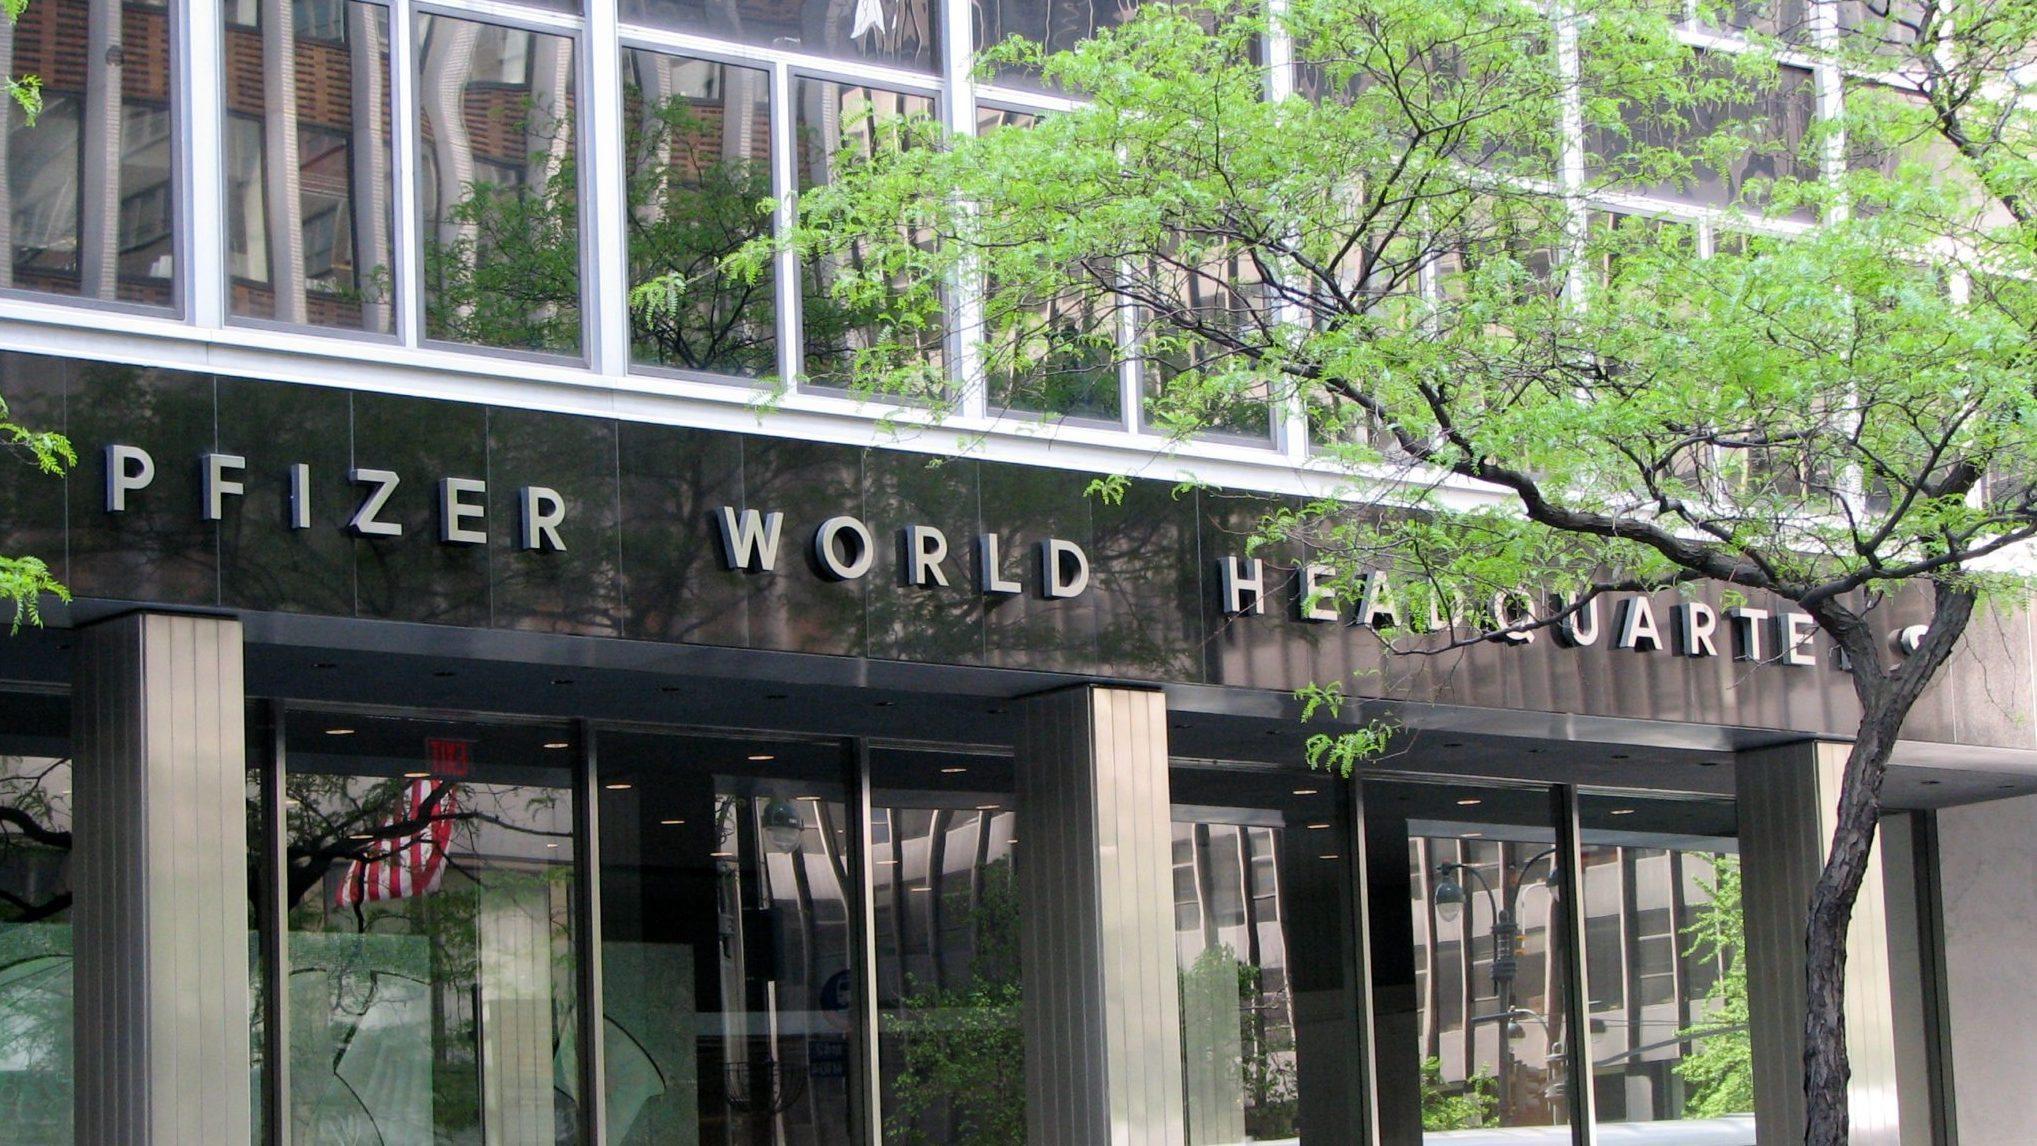 new_york_city_pfizer_world_headquarters_02